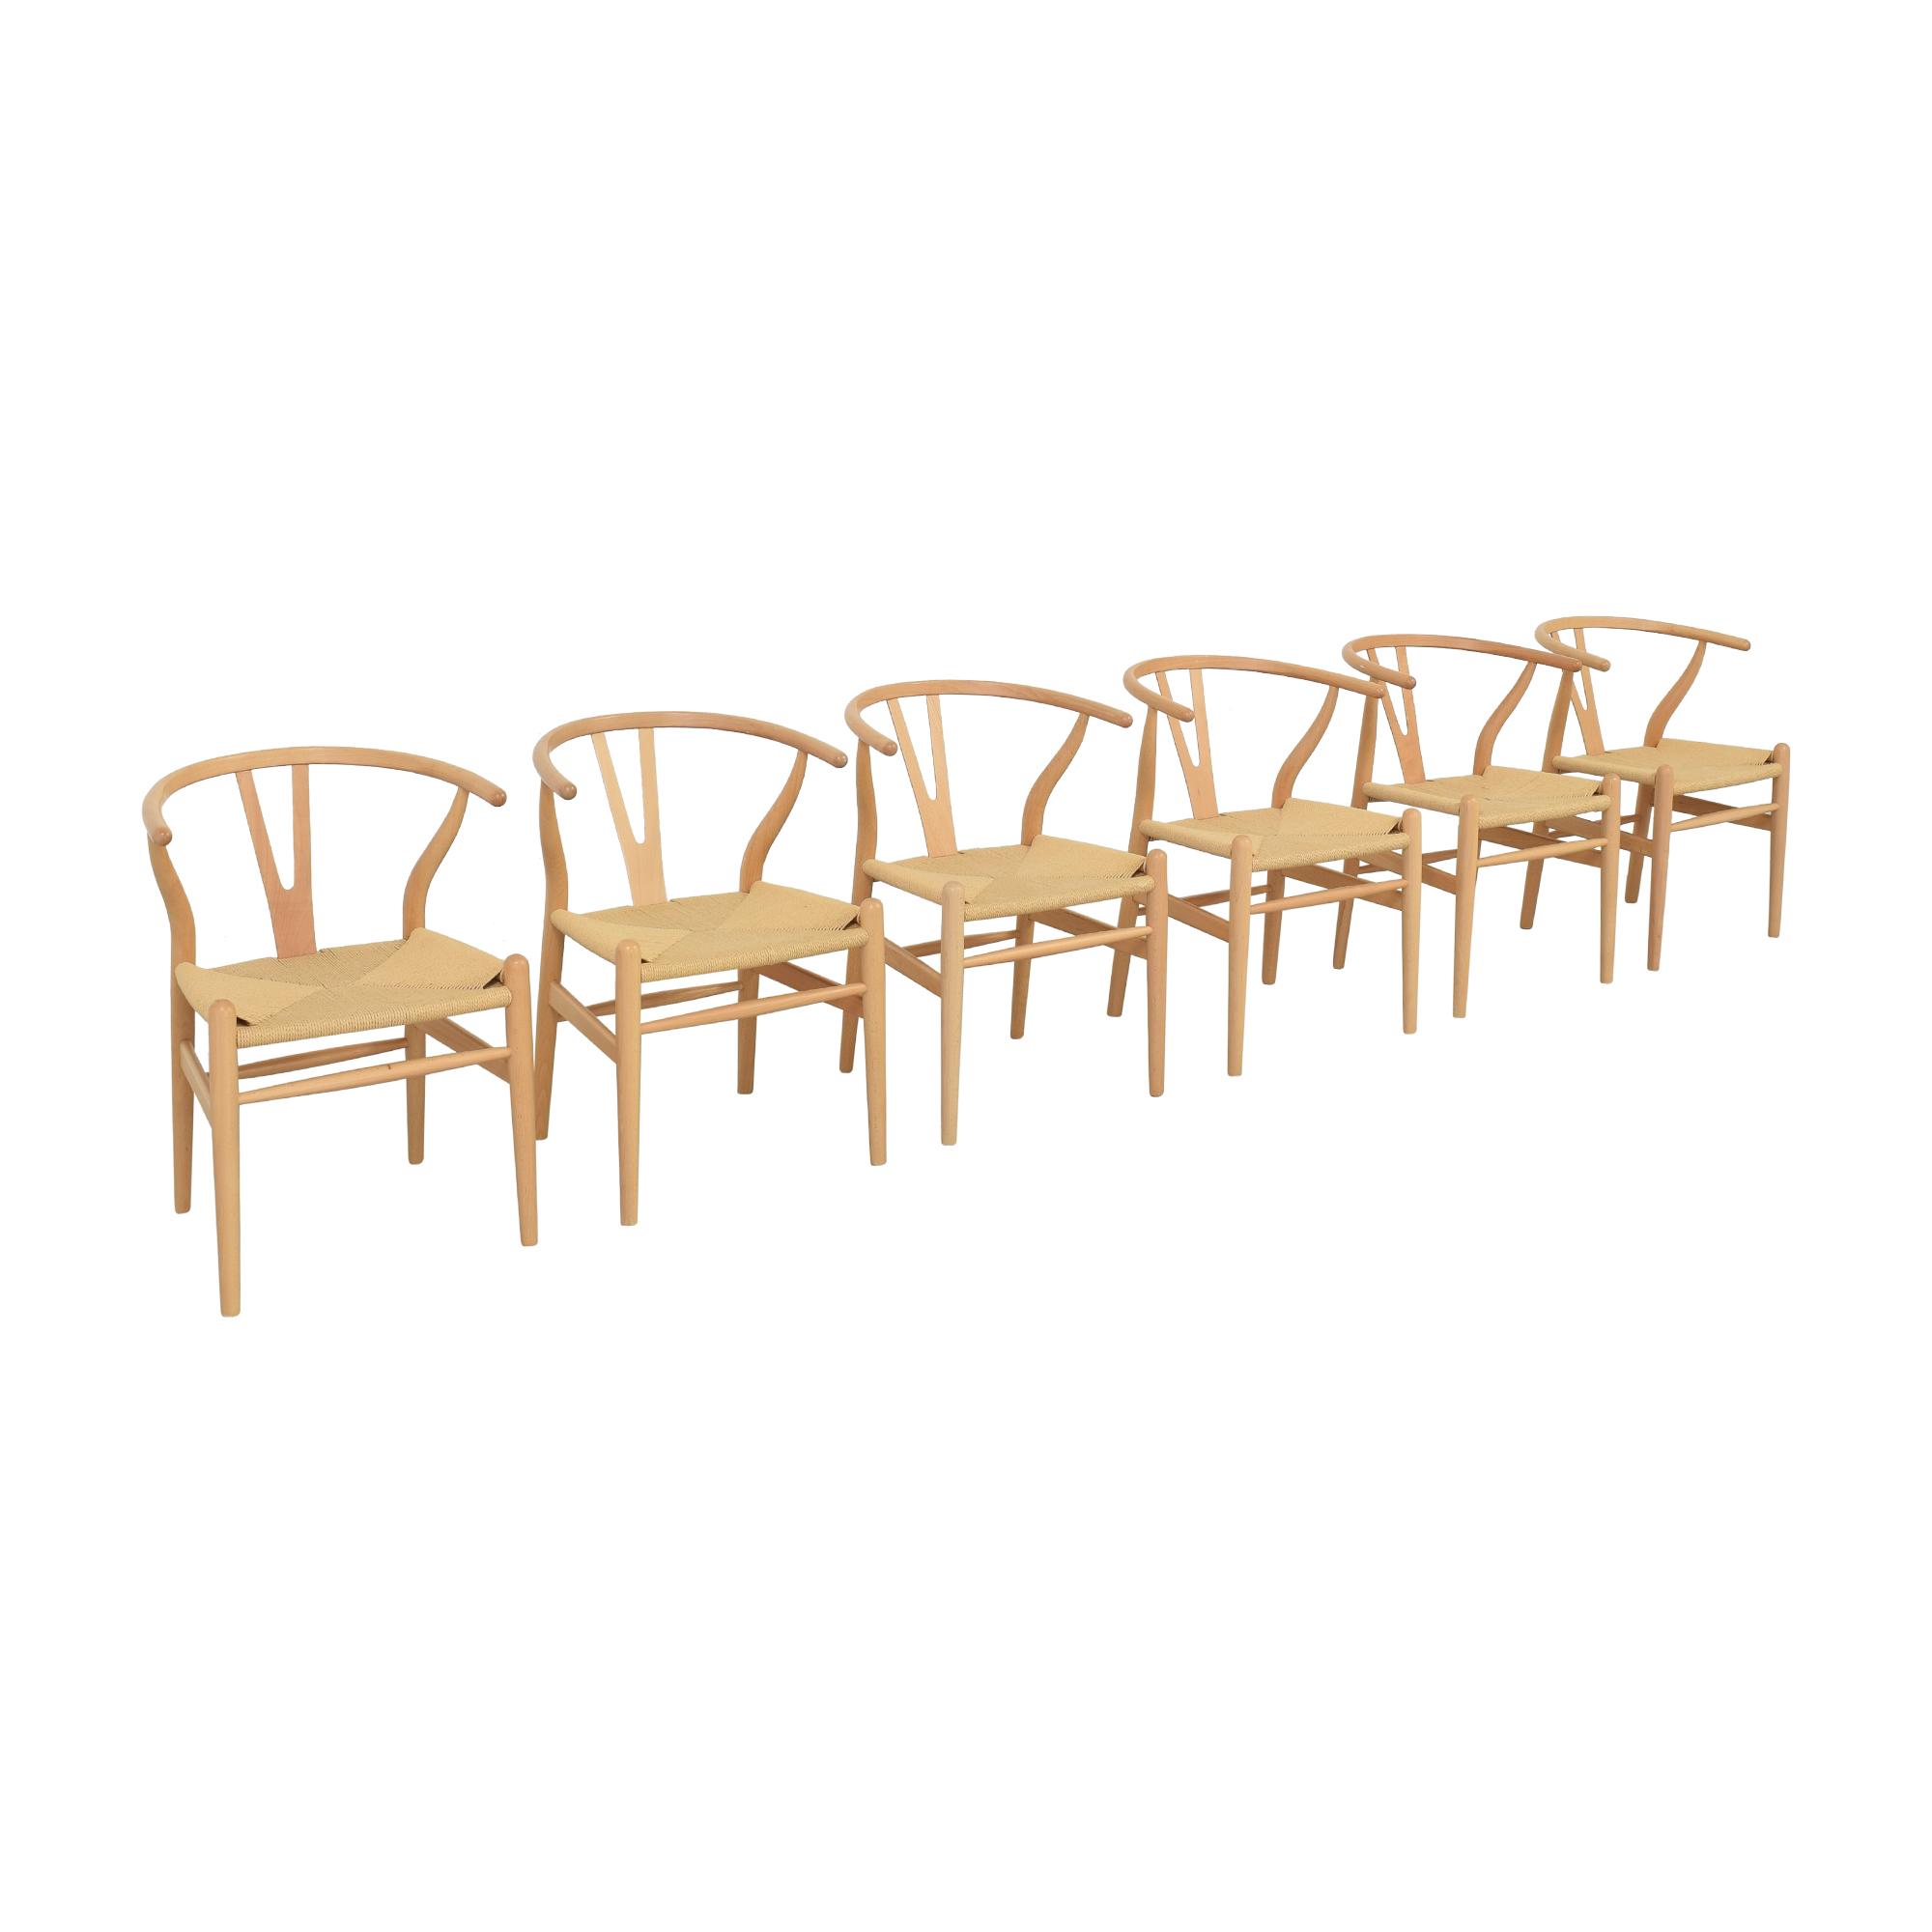 Baxton Studio Wishbone Modern Brown Wood Dining Chairs sale